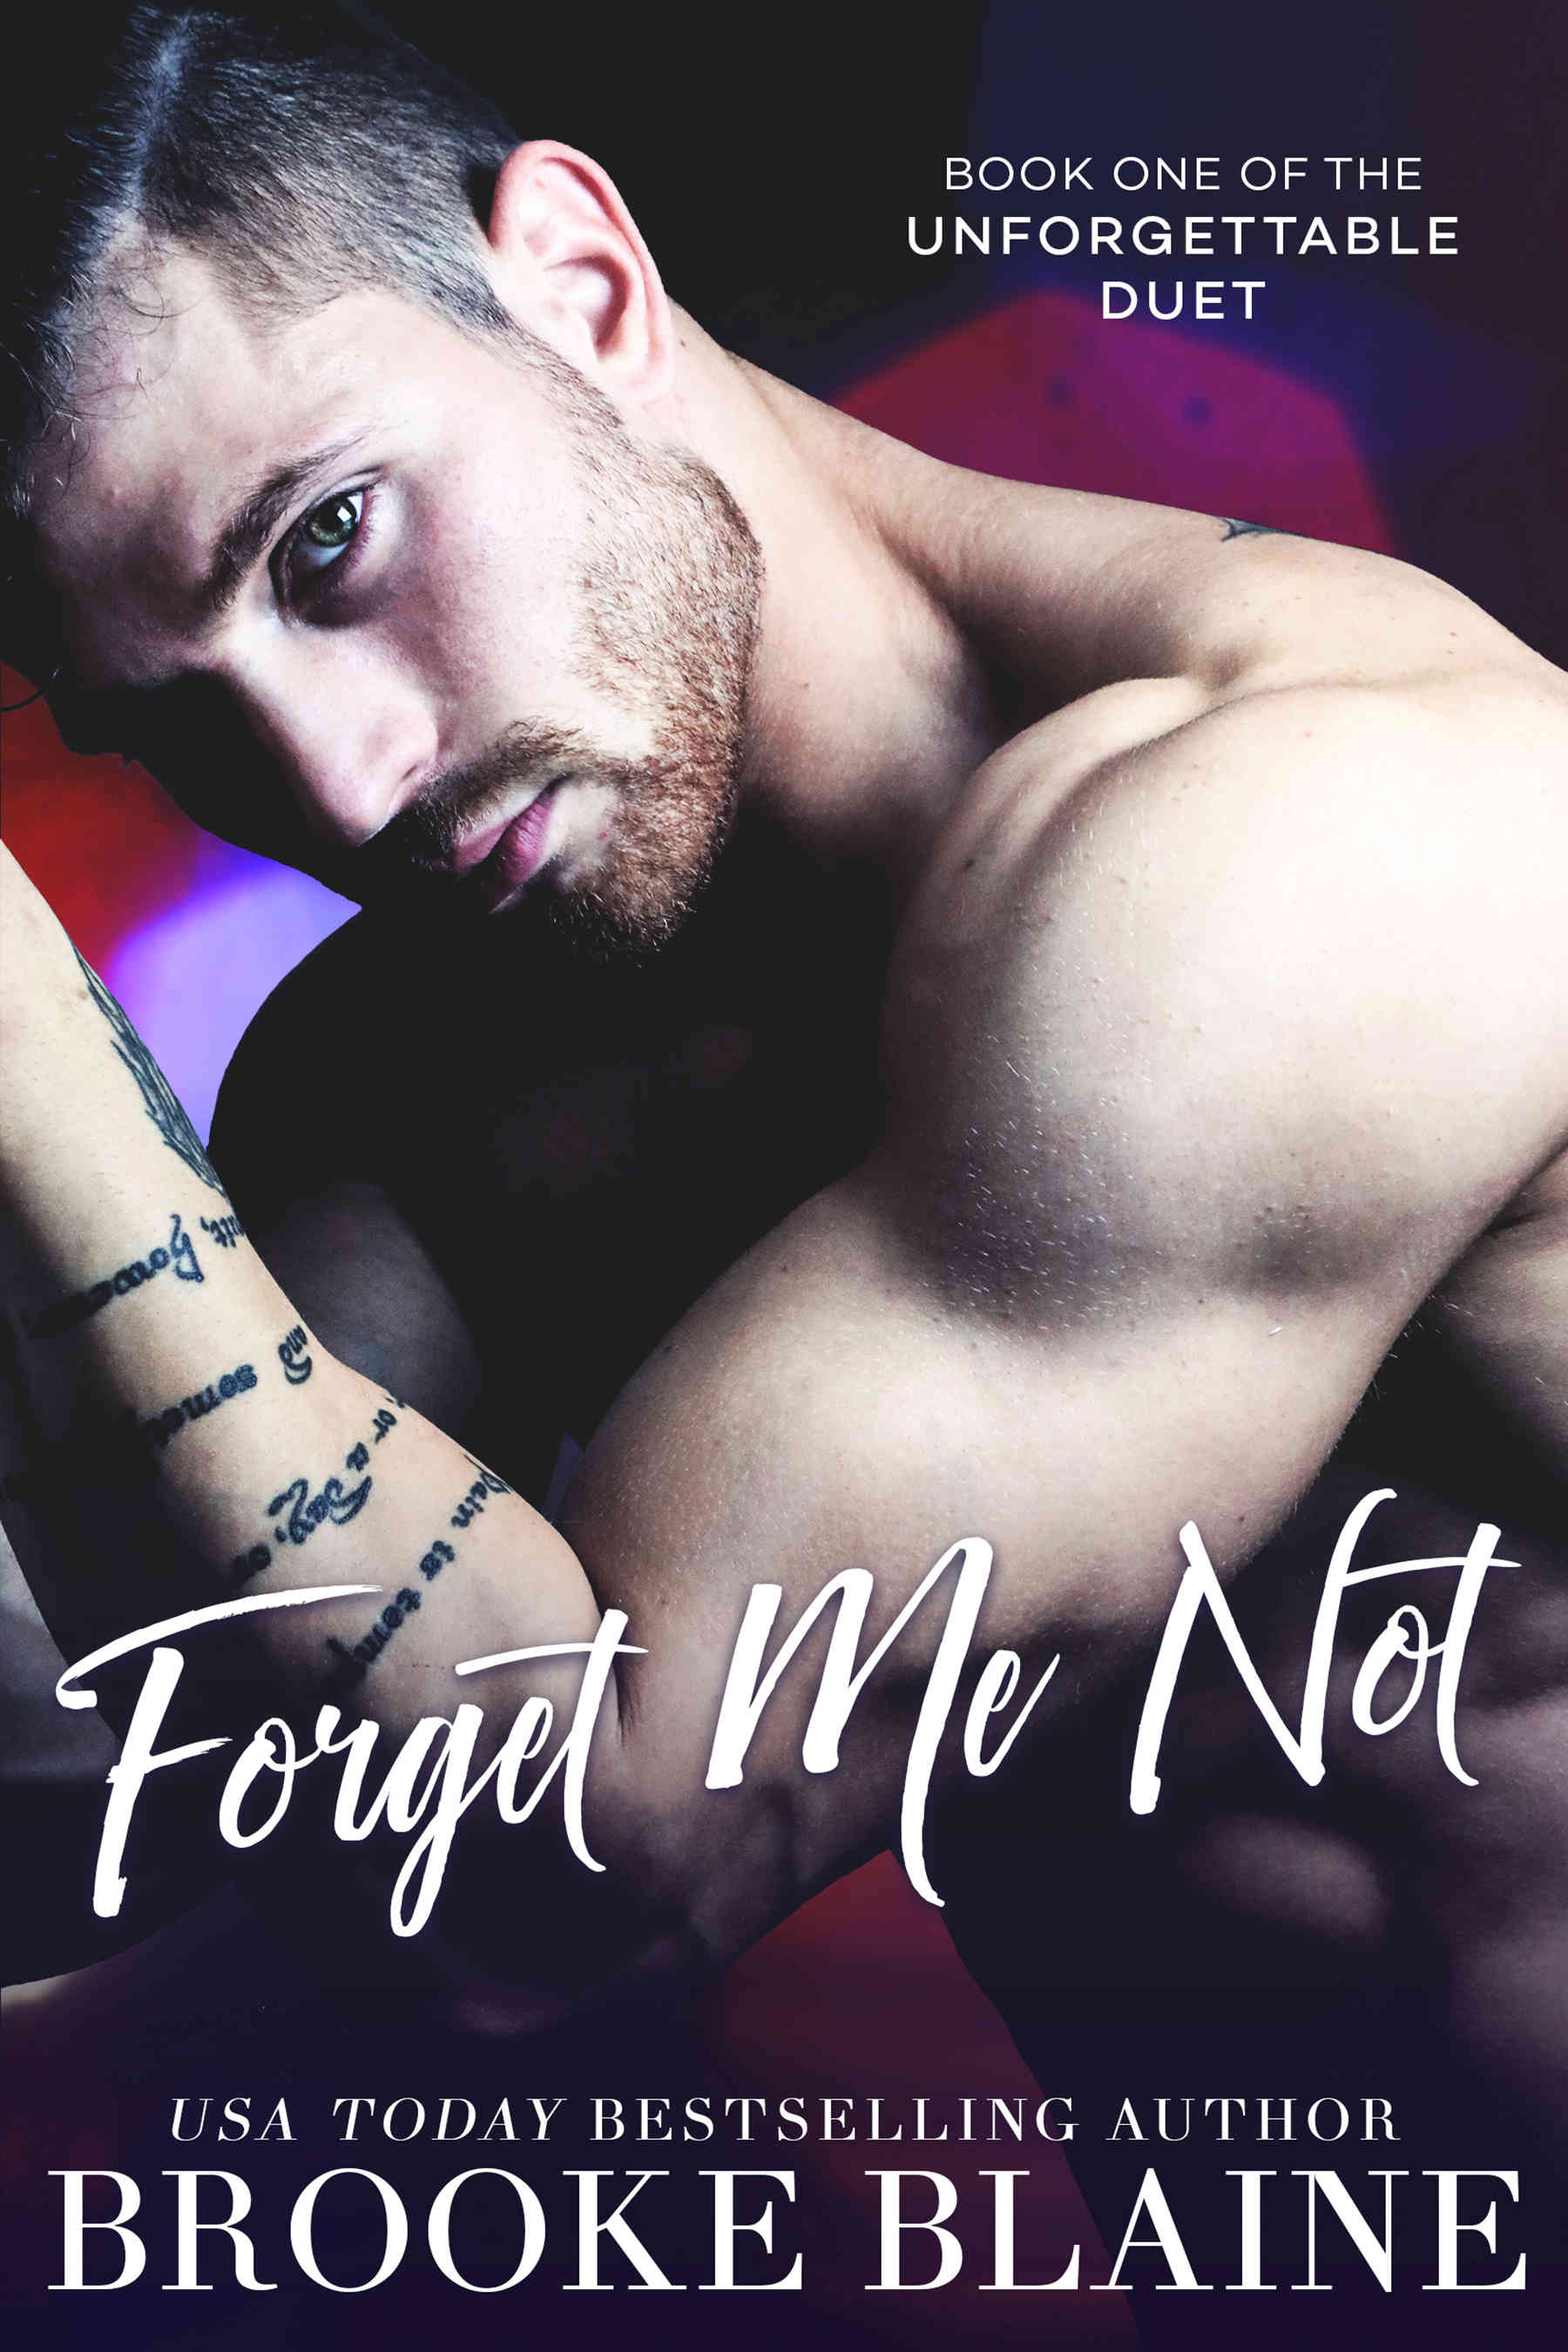 The unforgettable duet - Tome 1 : Forget me not de Brooke Blaine Fmn-eb10